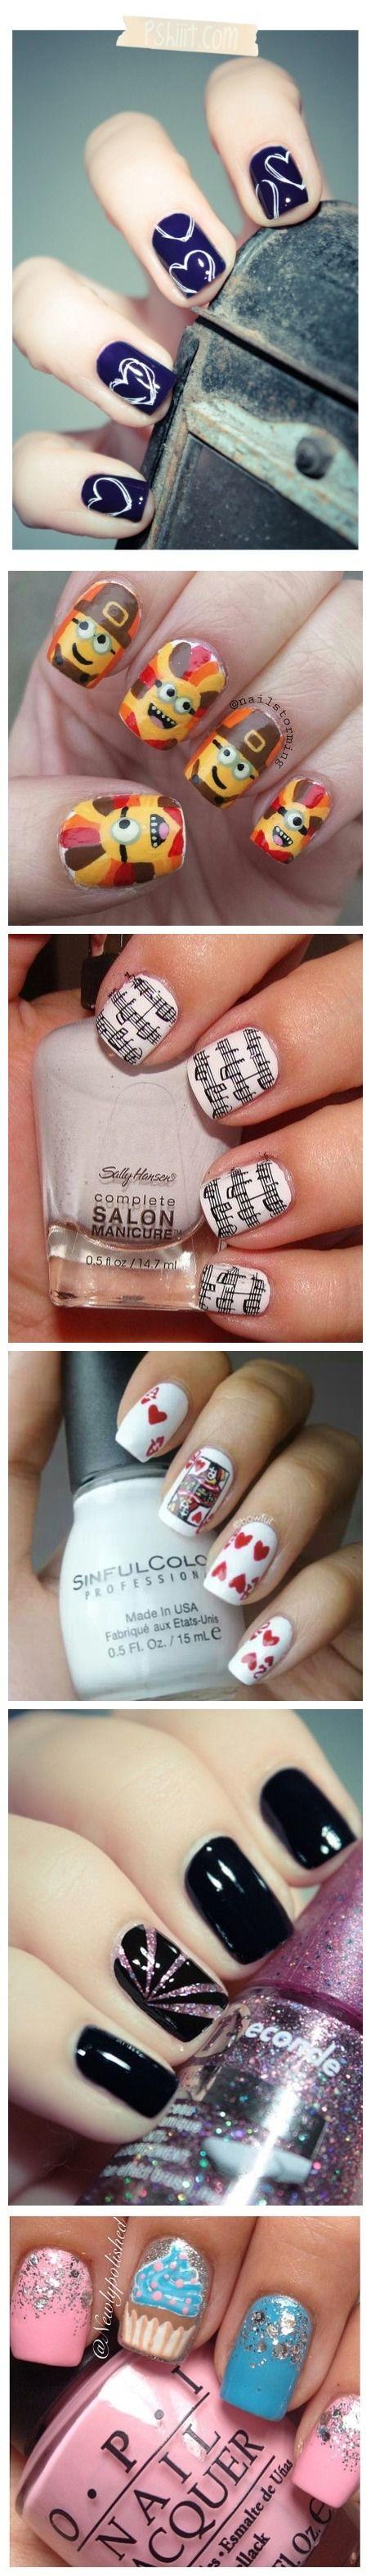 White Doodled Hearts on navy polish nail art